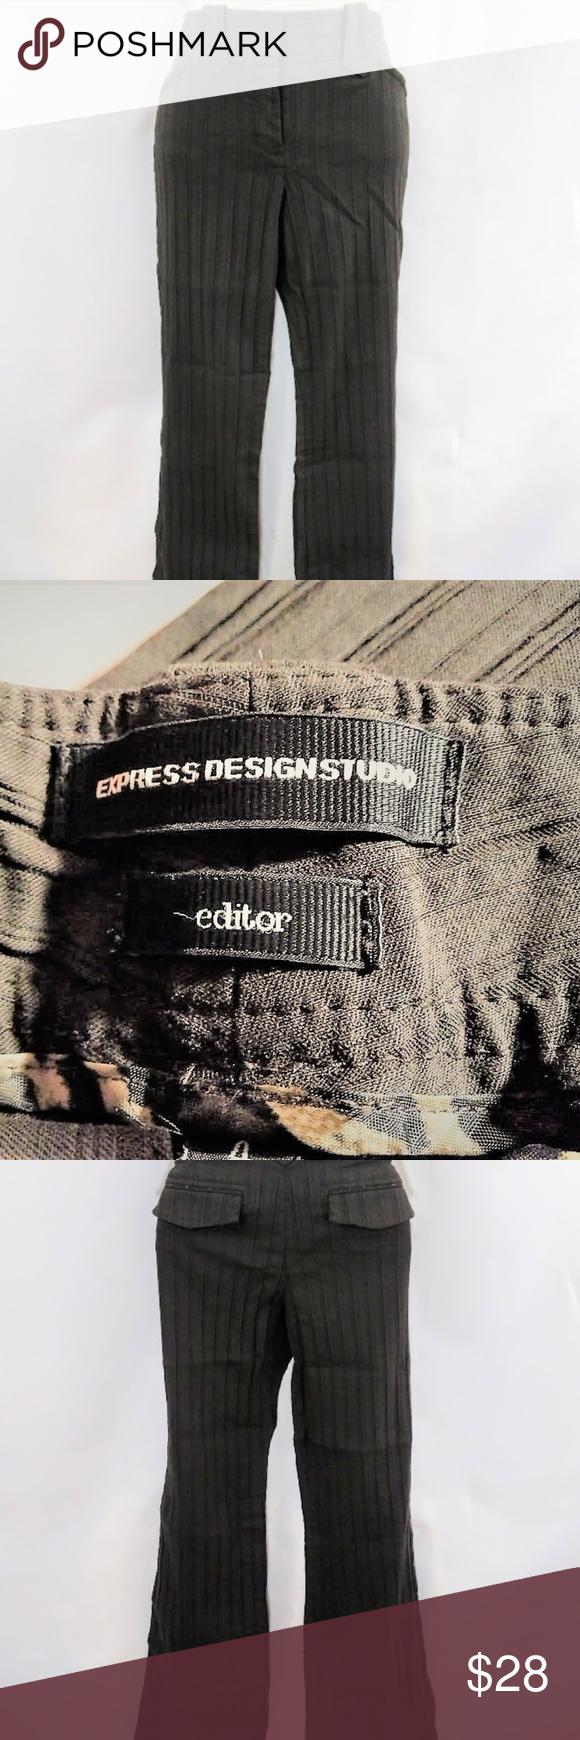 Size dark brown dress pants cp express design studio editor